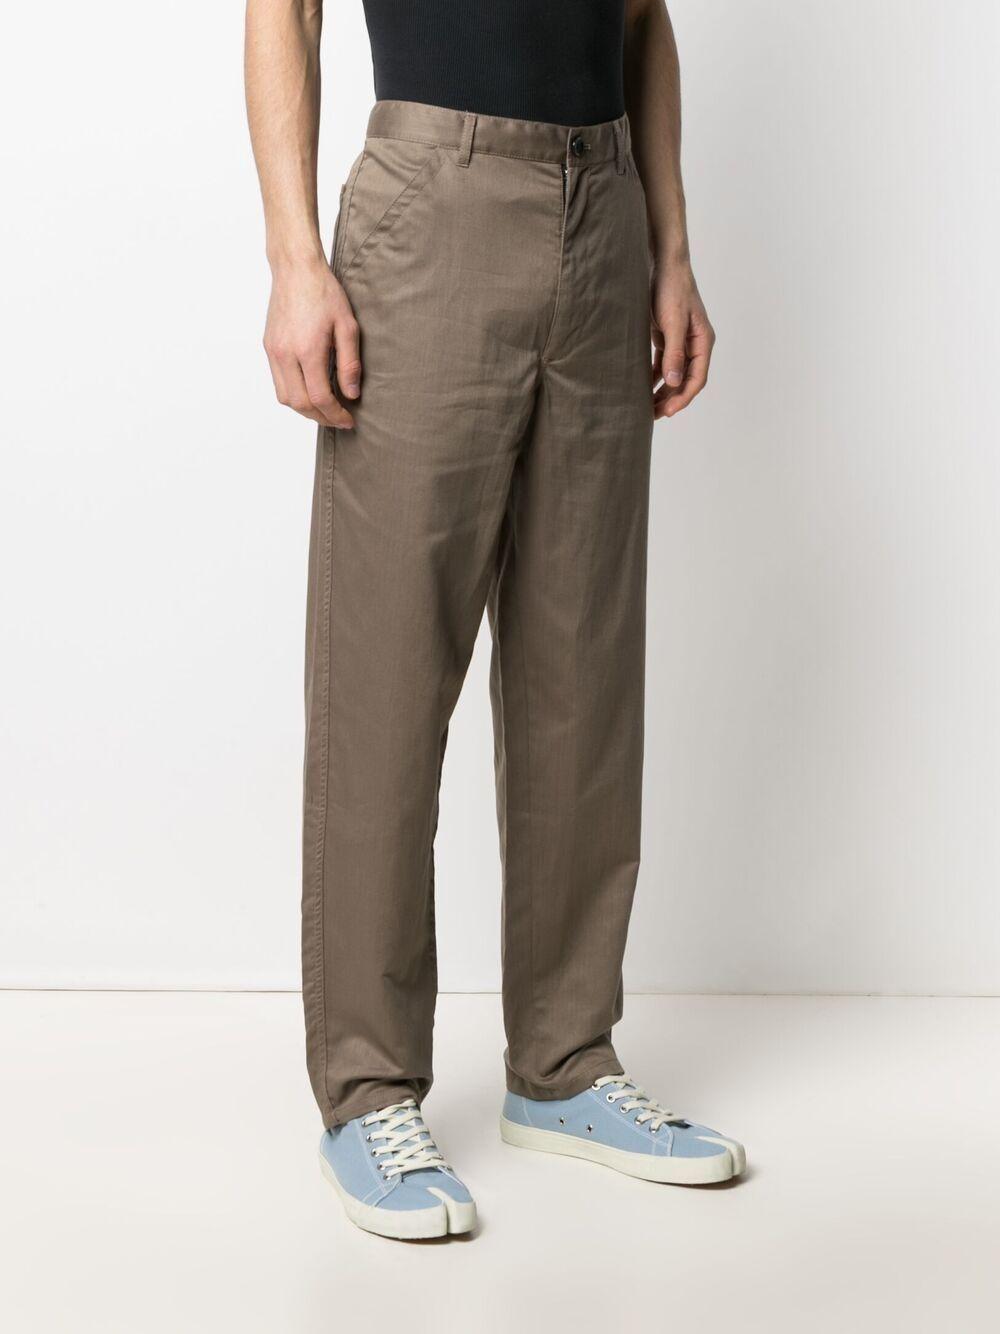 Comme des garçons pantaloni a gamba dritta uomo COMME DES GARÇONS SHIRT | Pantaloni | FG-P004KHAKI